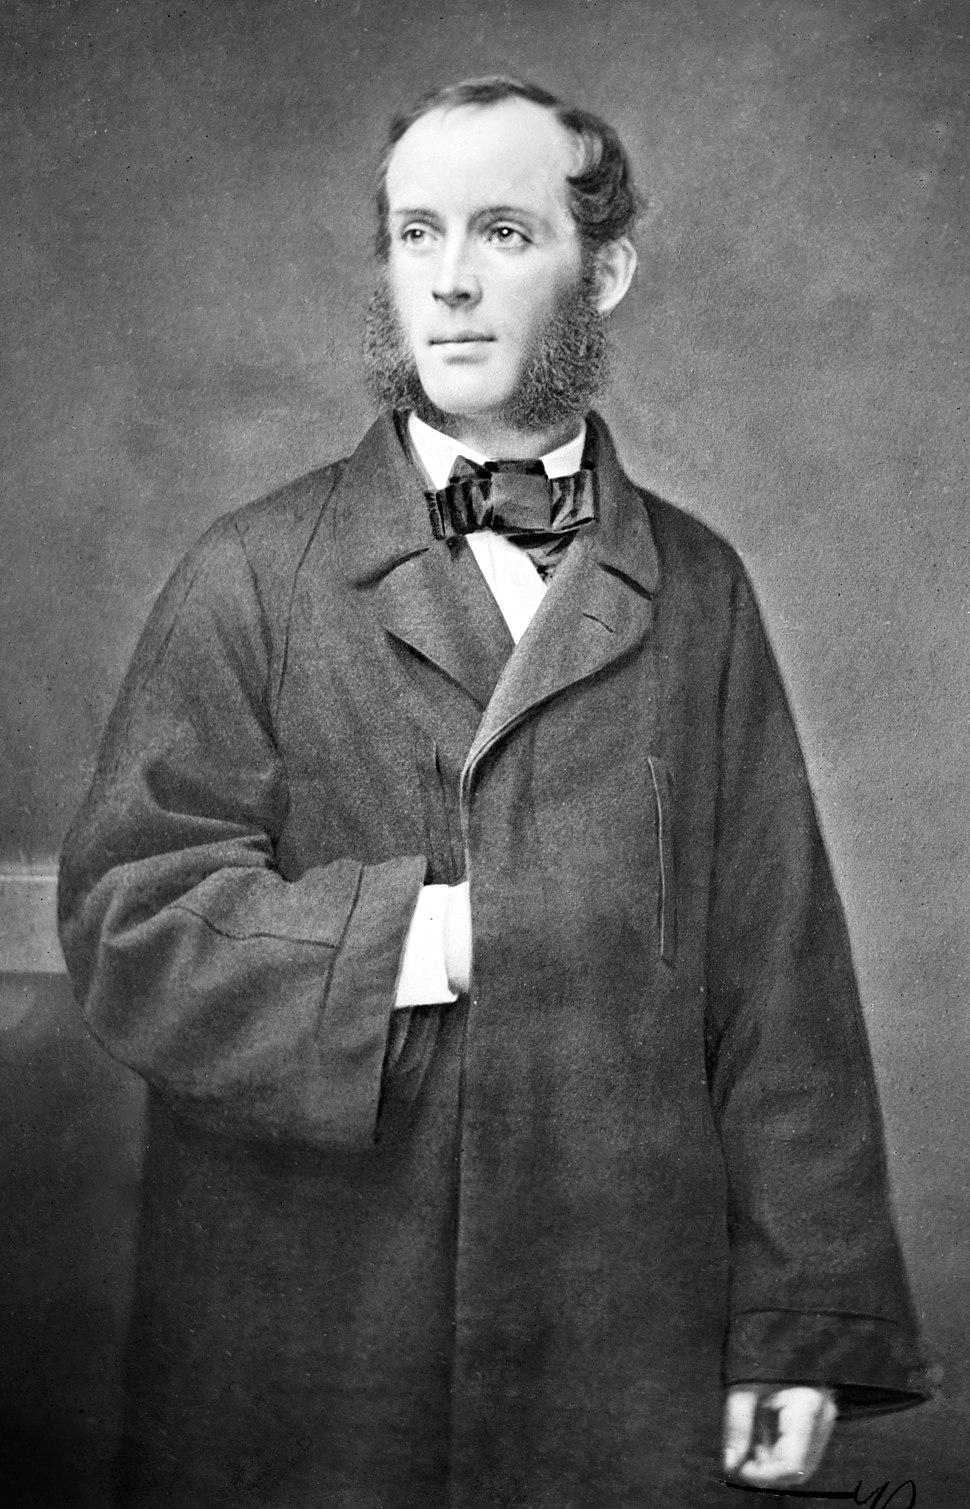 Frederic Edwin Church - Brady-Handy (cropped)